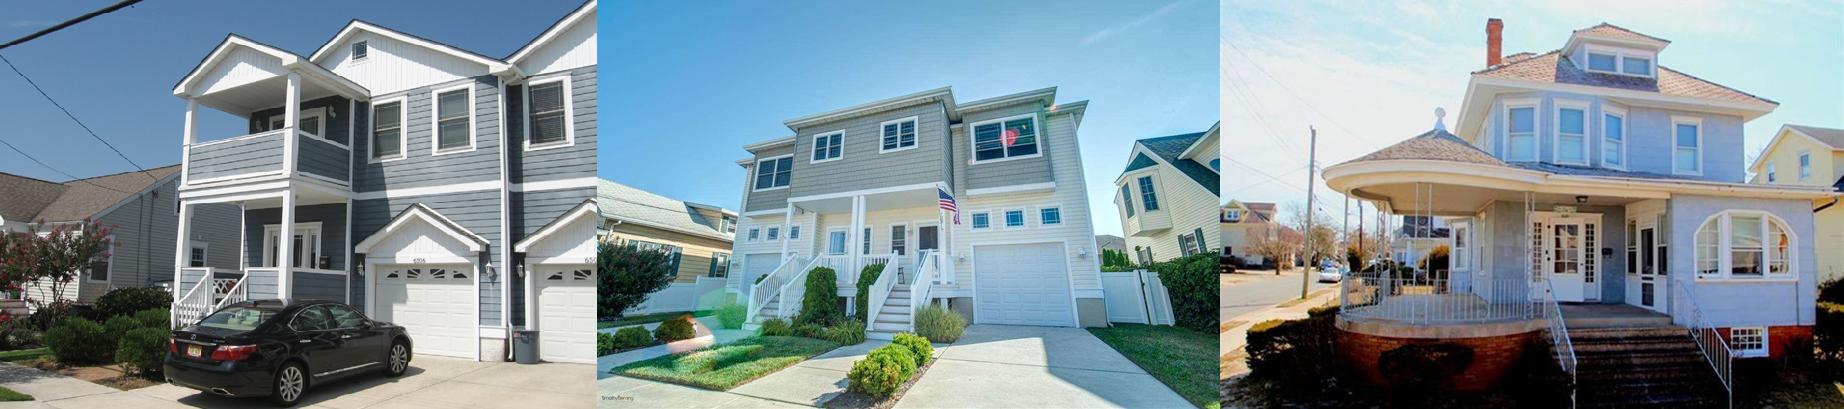 buy home near wildwood crest